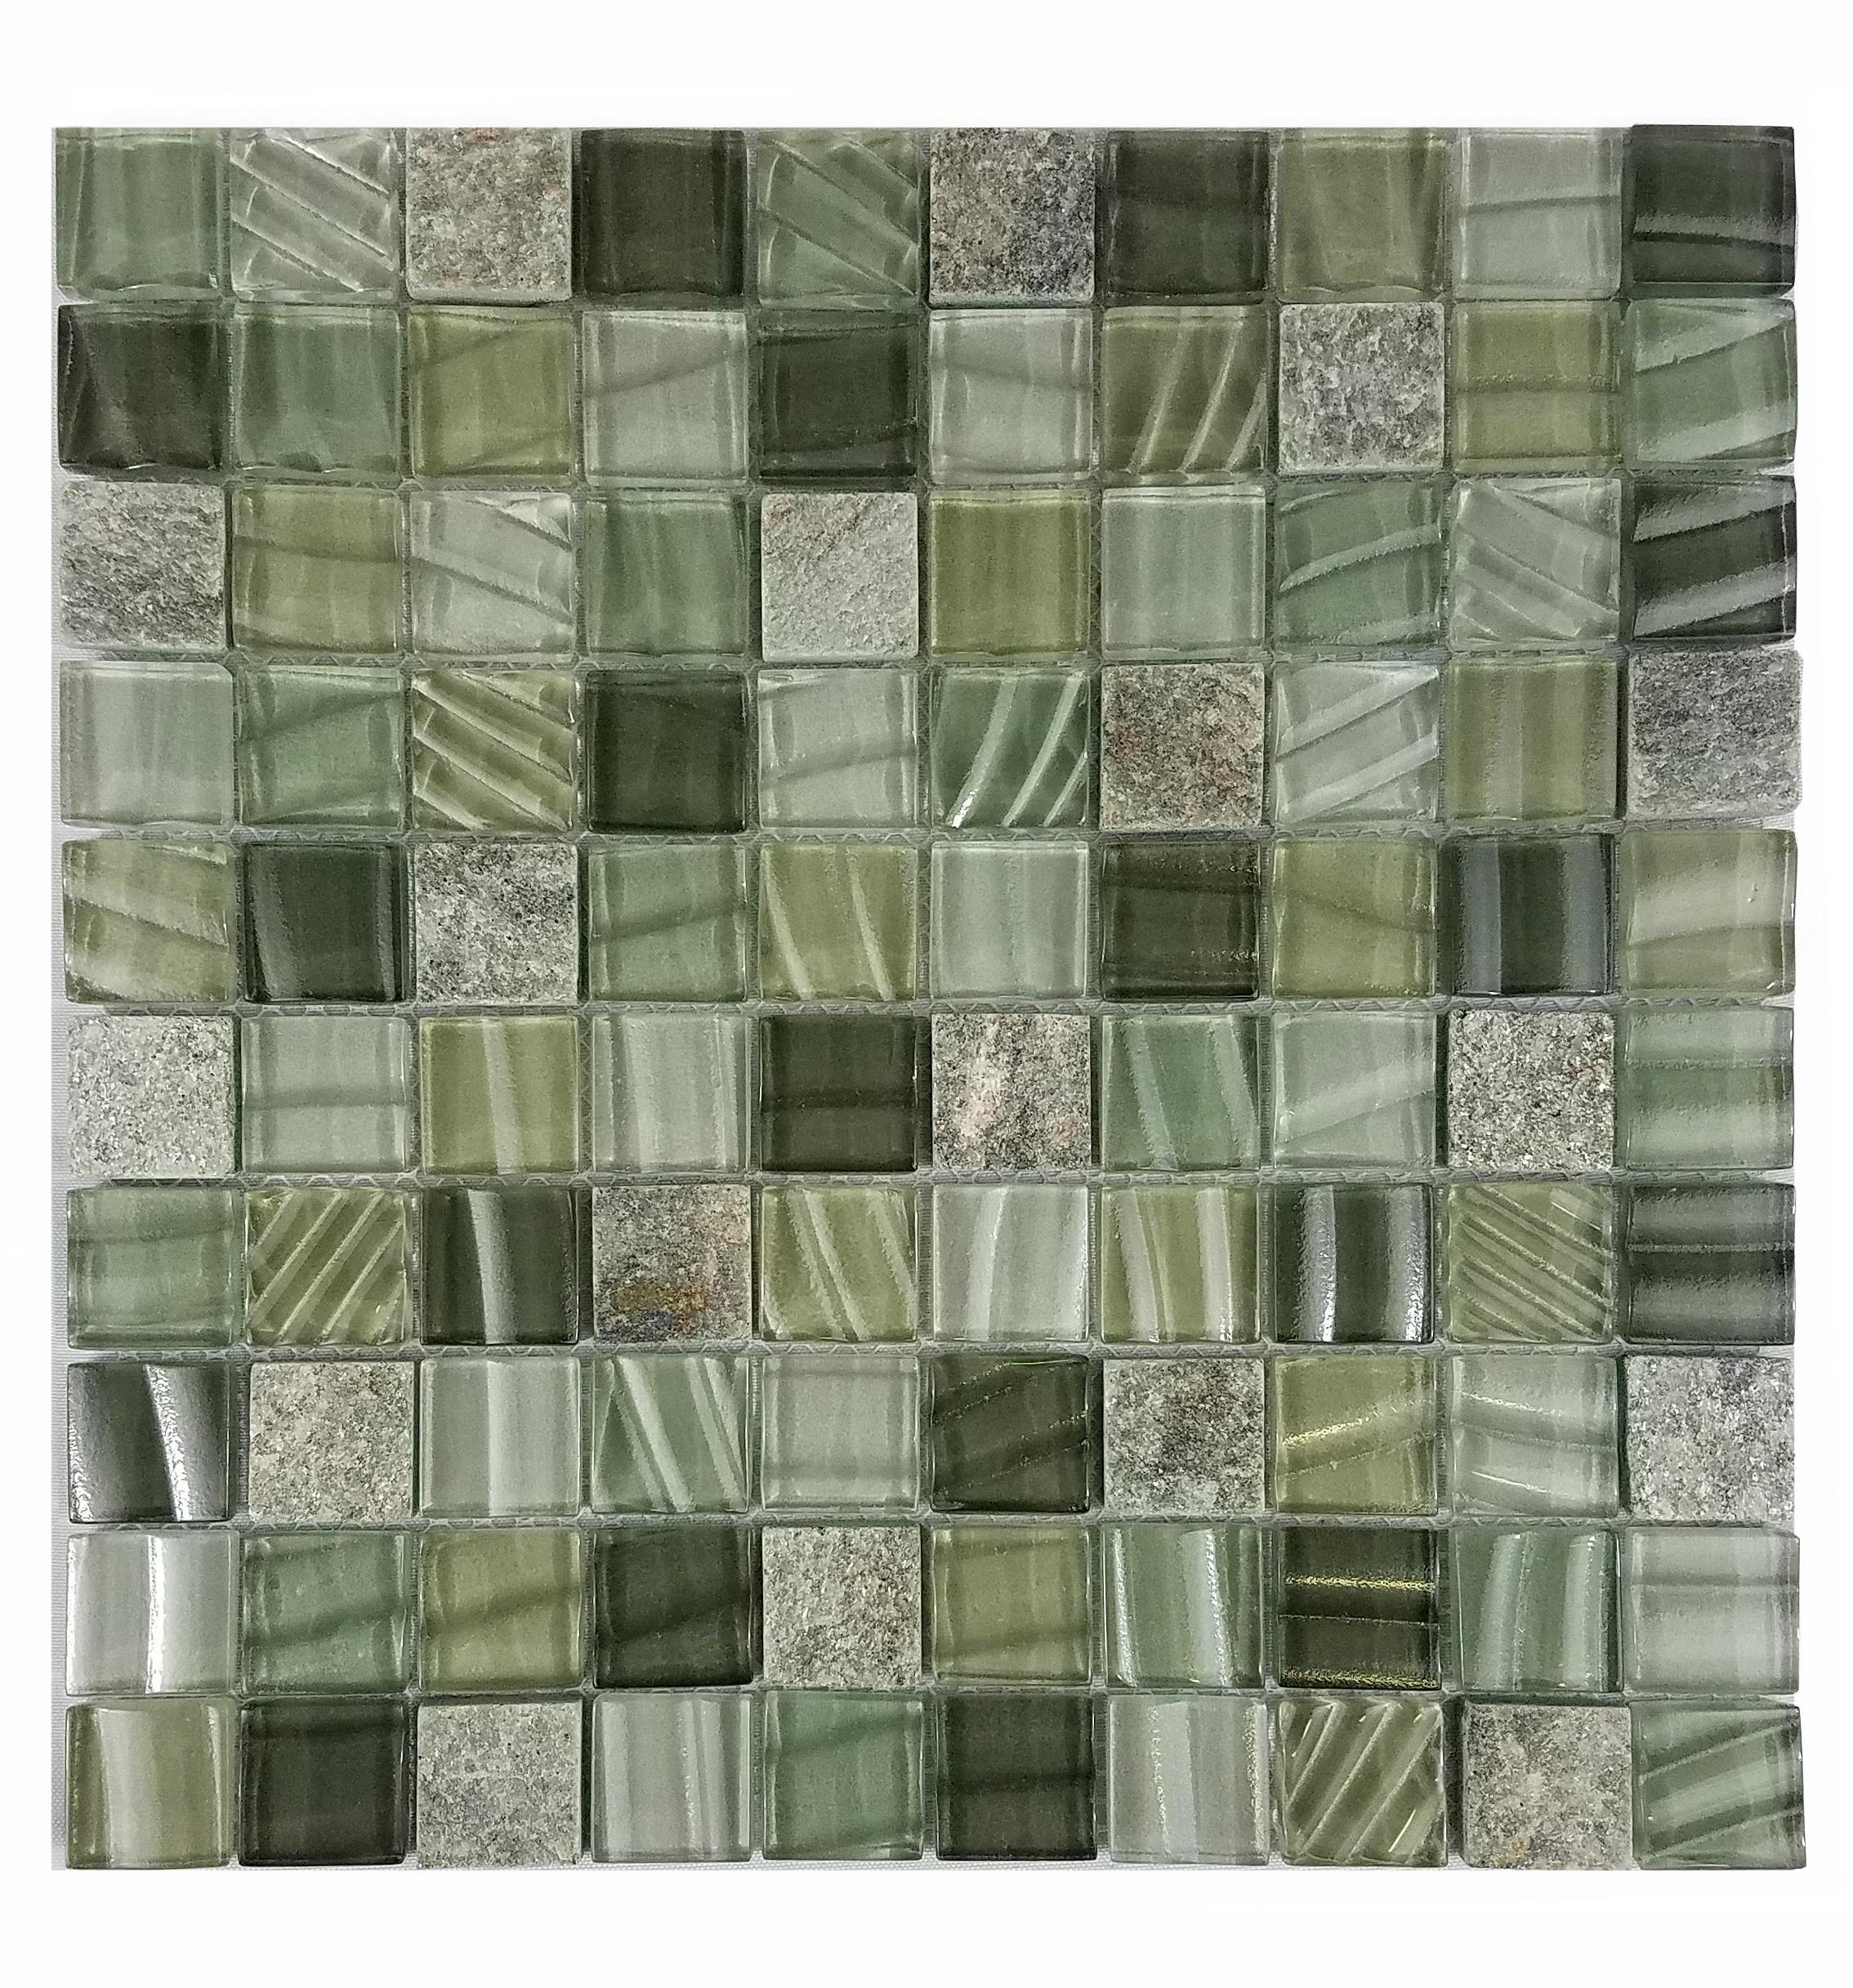 "New Era II 1"" x 1"" Multi Finish Green Glass and Stone Square Backsplash Mosaic Wall & Floor Tile"